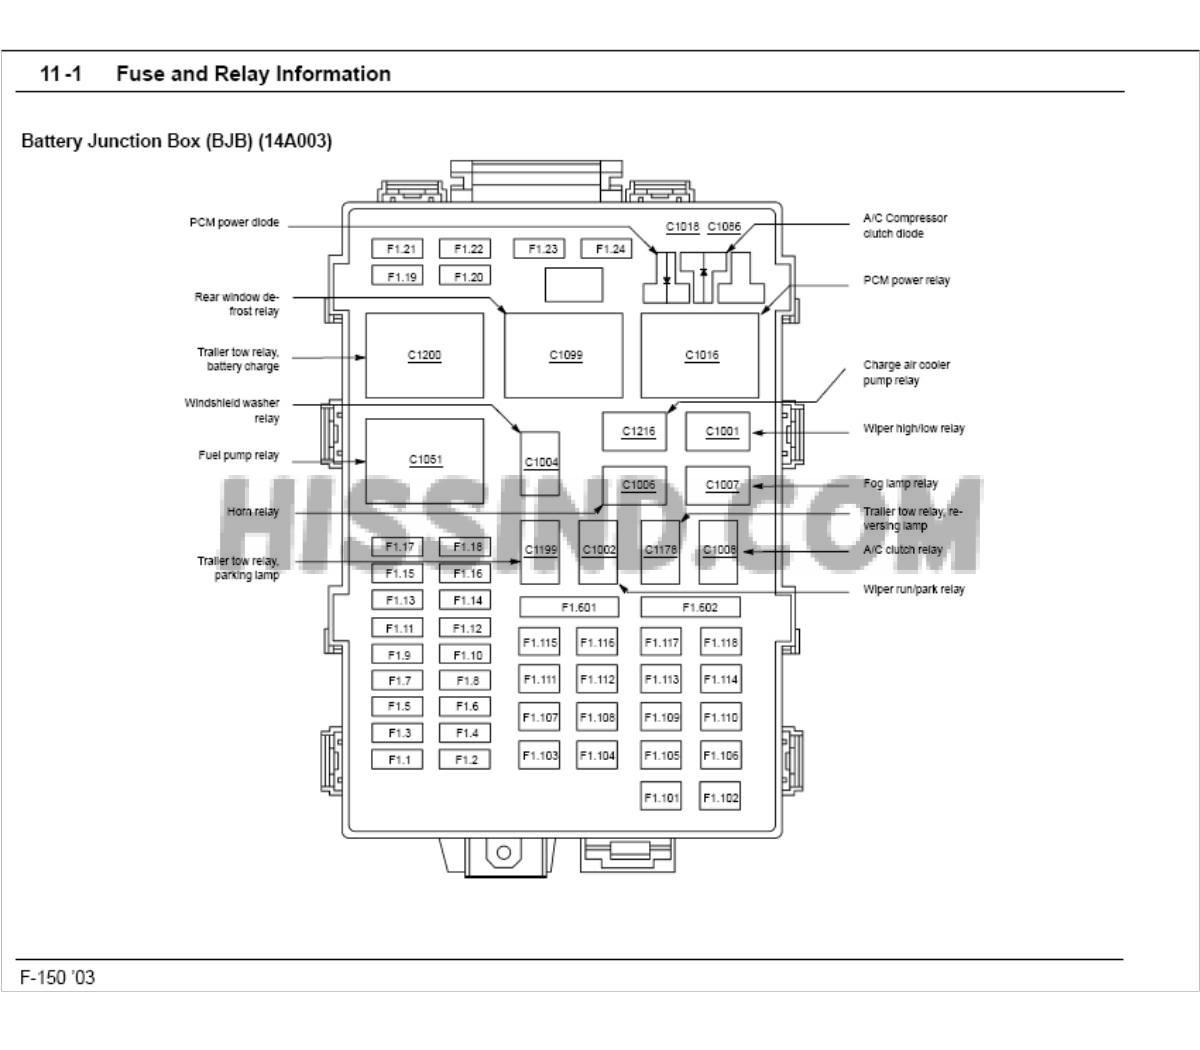 2003 Ford F 150 Xl Fuse Diagram Schematics Data F650 Ac Wiring Explained Diagrams 2000 F150